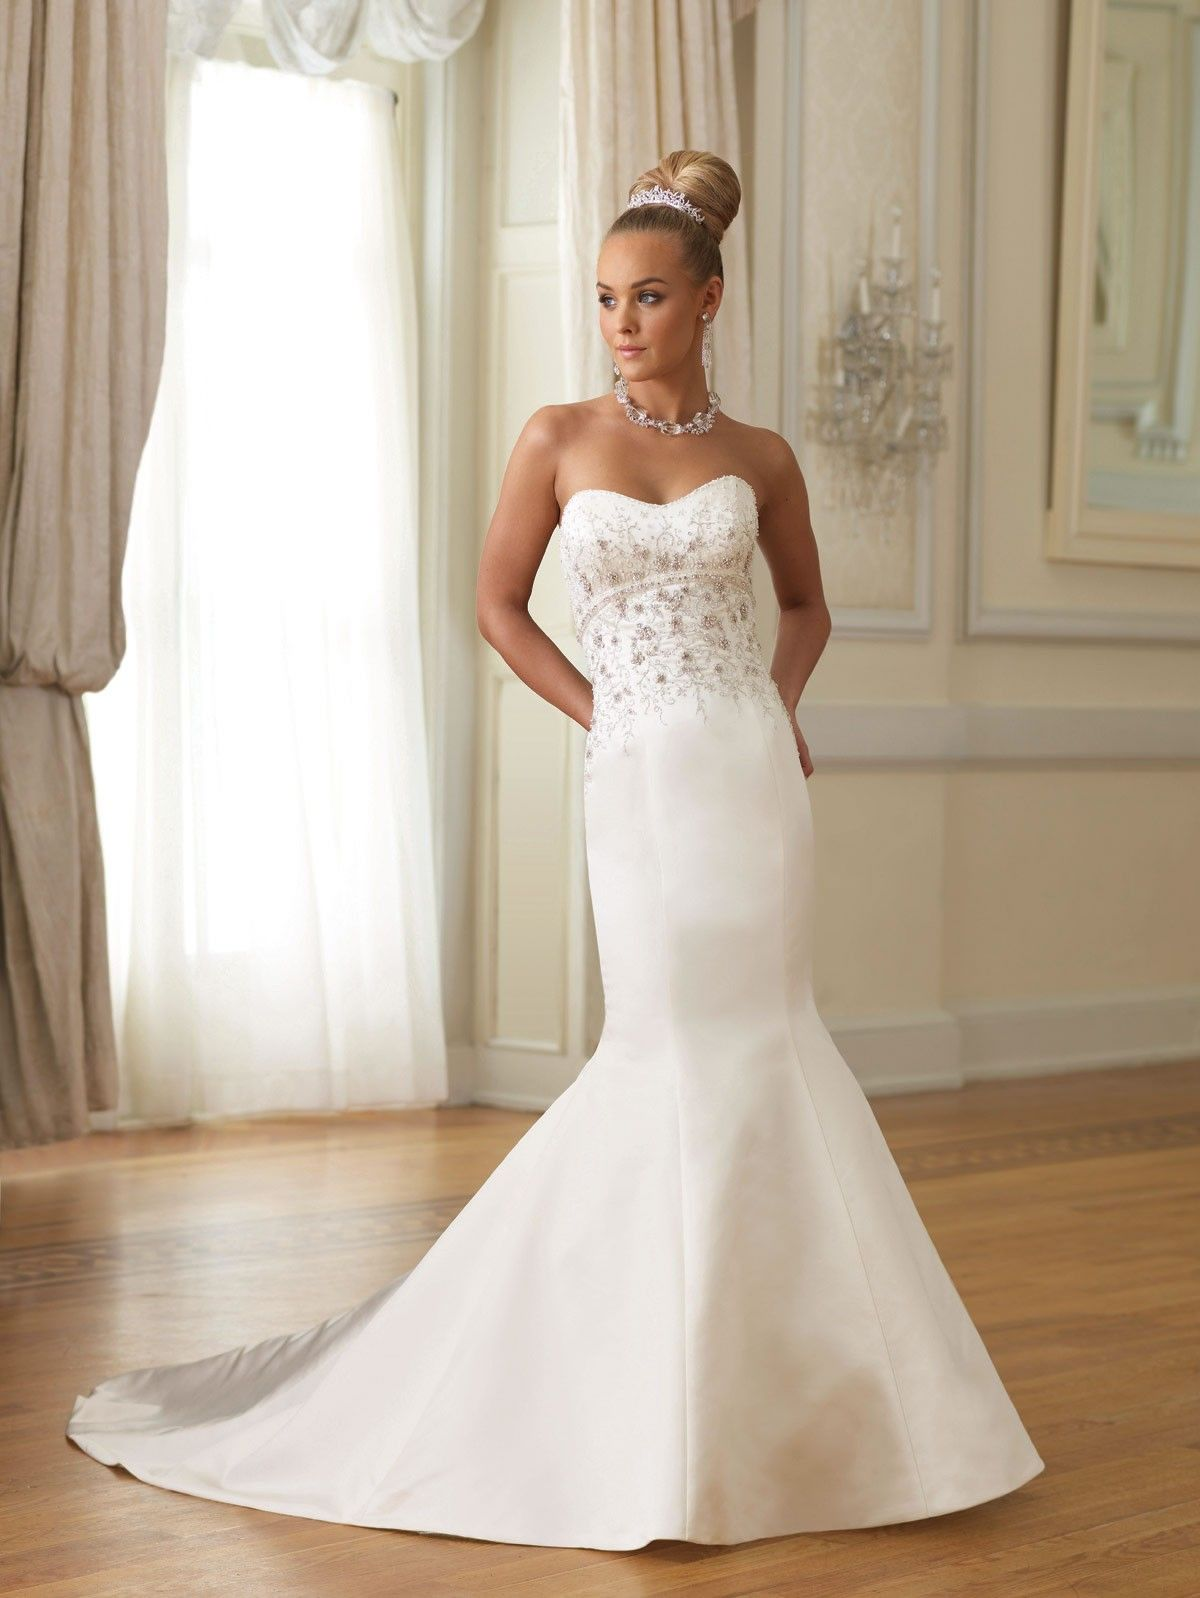 Dipped wedding dress  Satin Curved Neckline Low Dipped Back Bodice Mermaid Wedding Dress